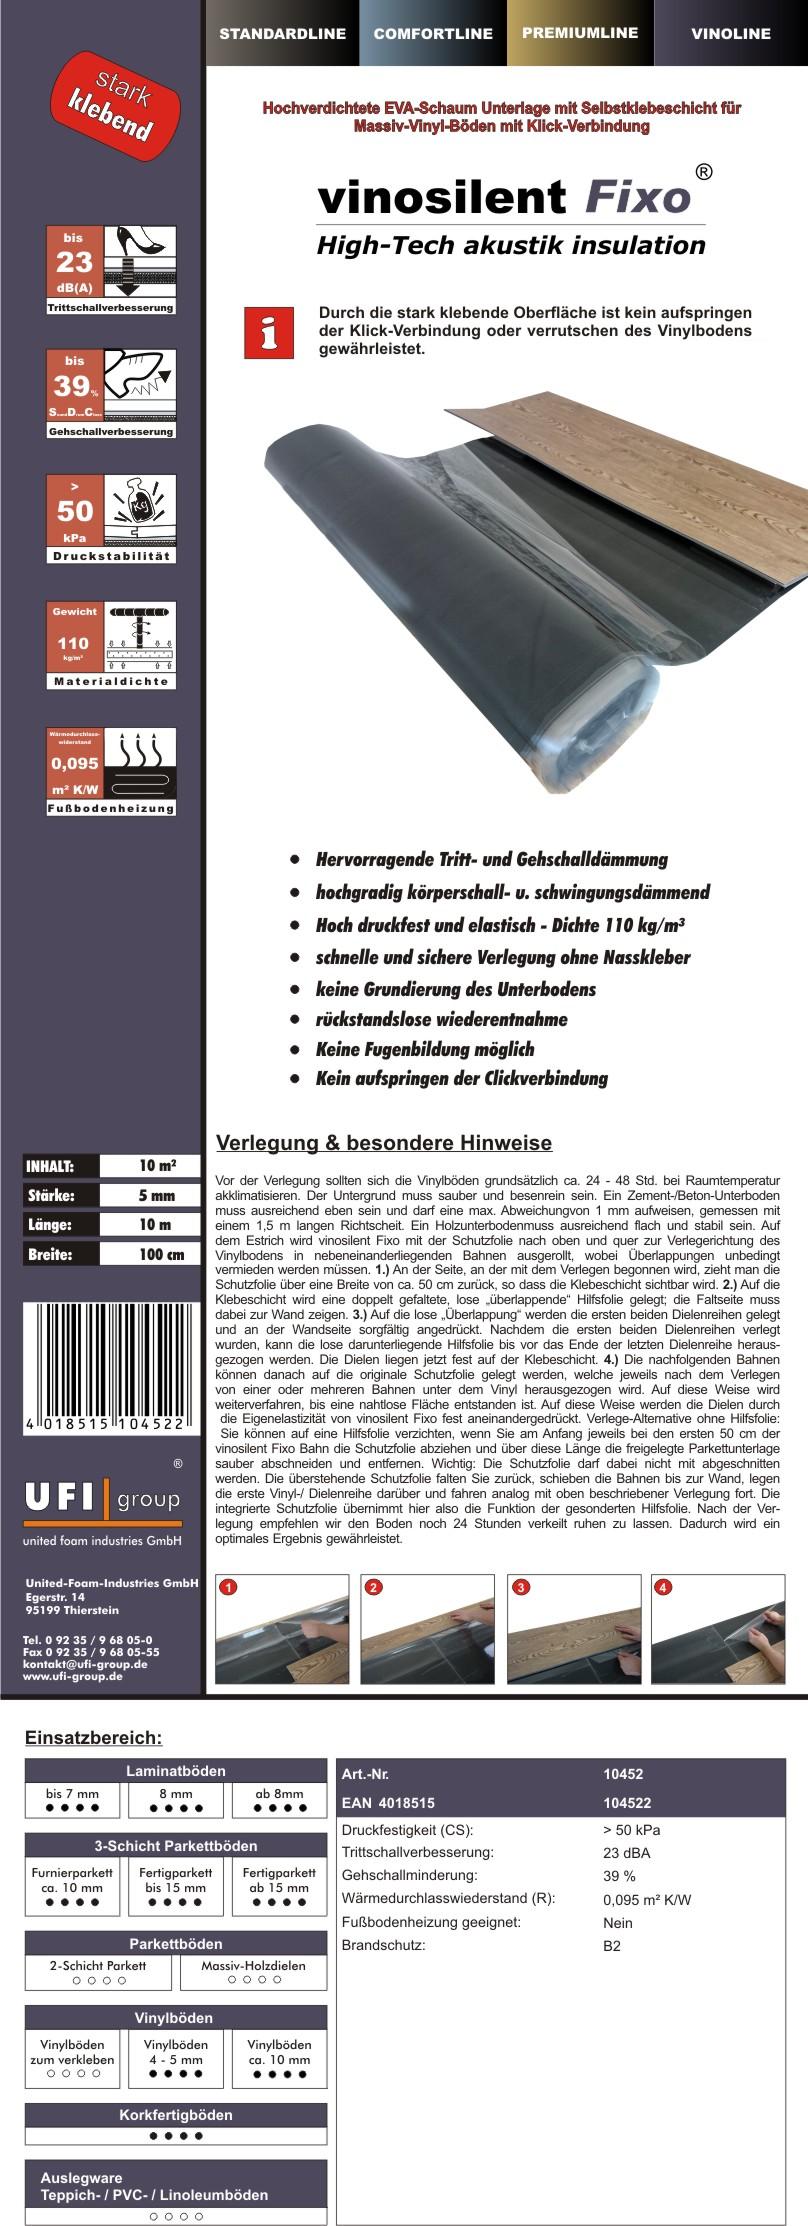 vinosilentfixo-5mm-Einleger